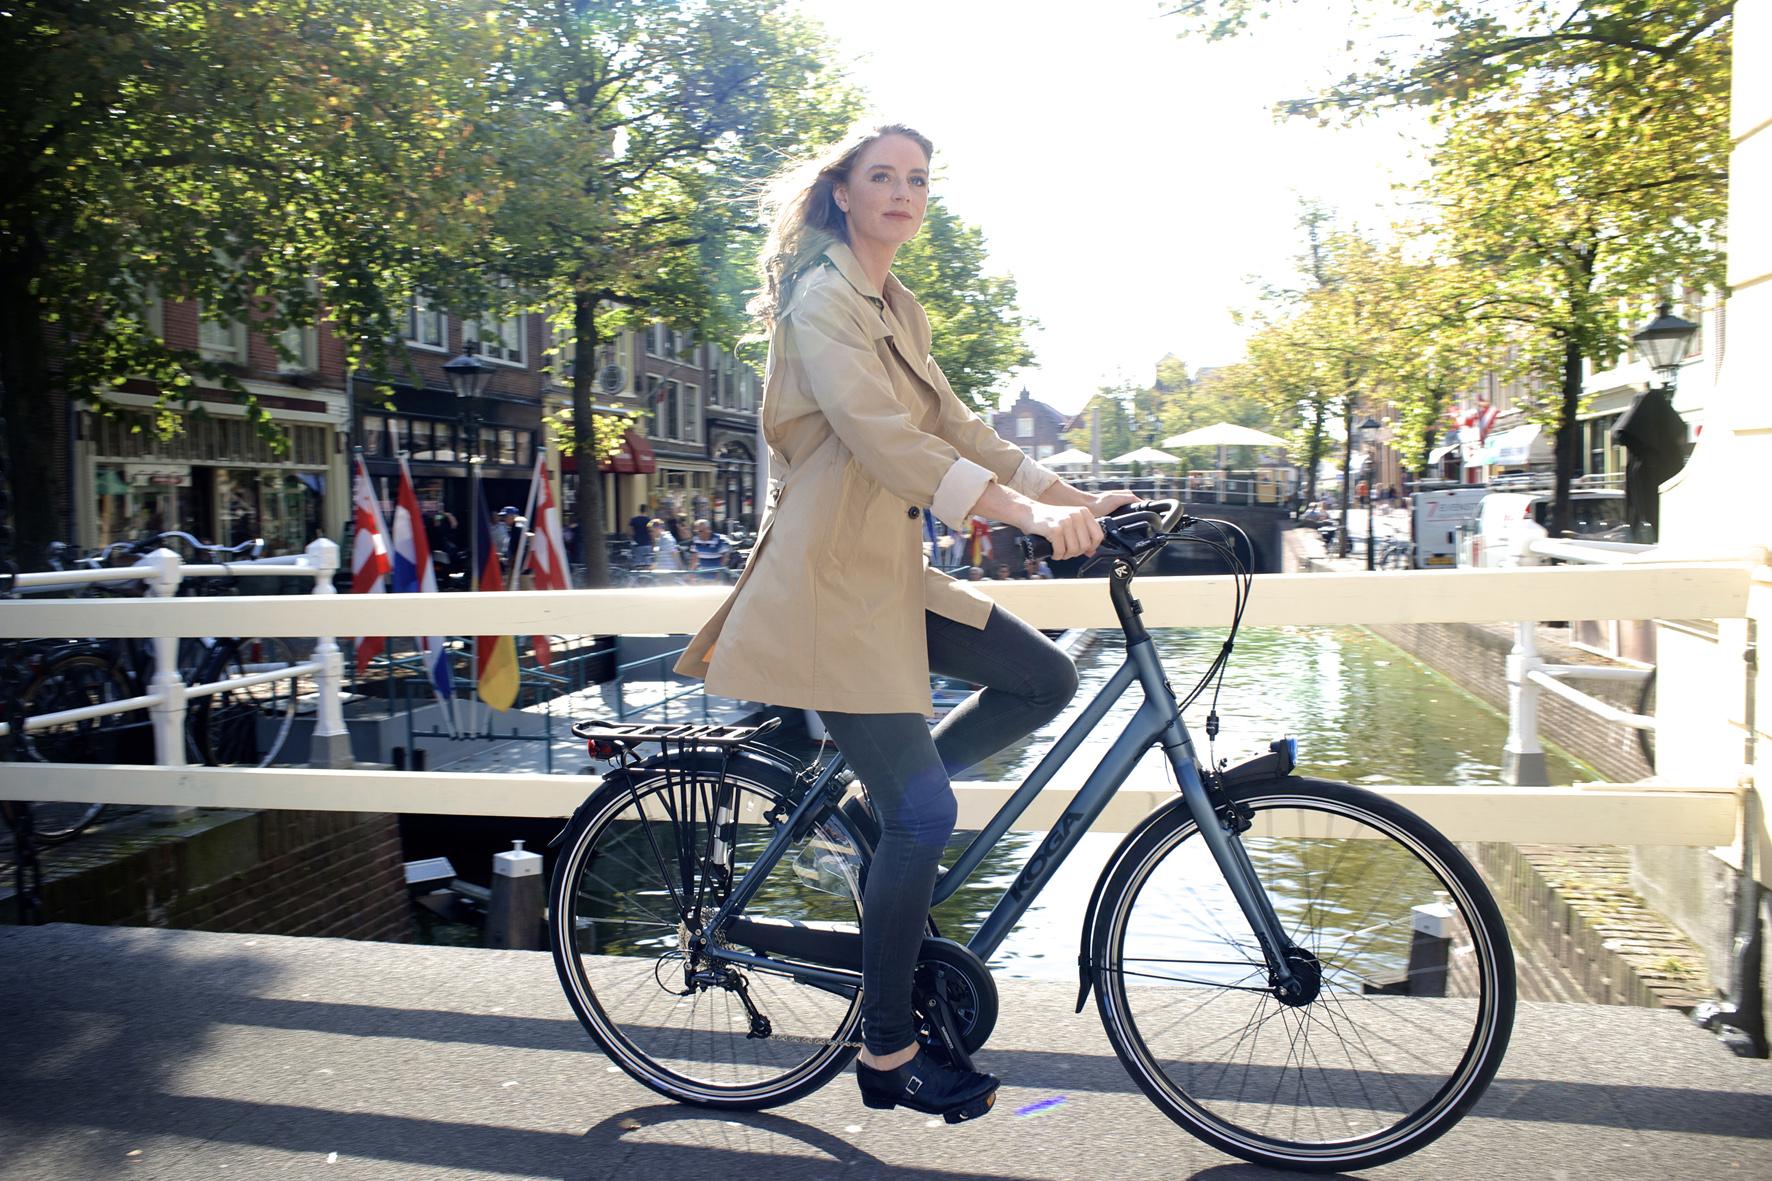 Fahrrad-Trend: Frauen mögen's bequem